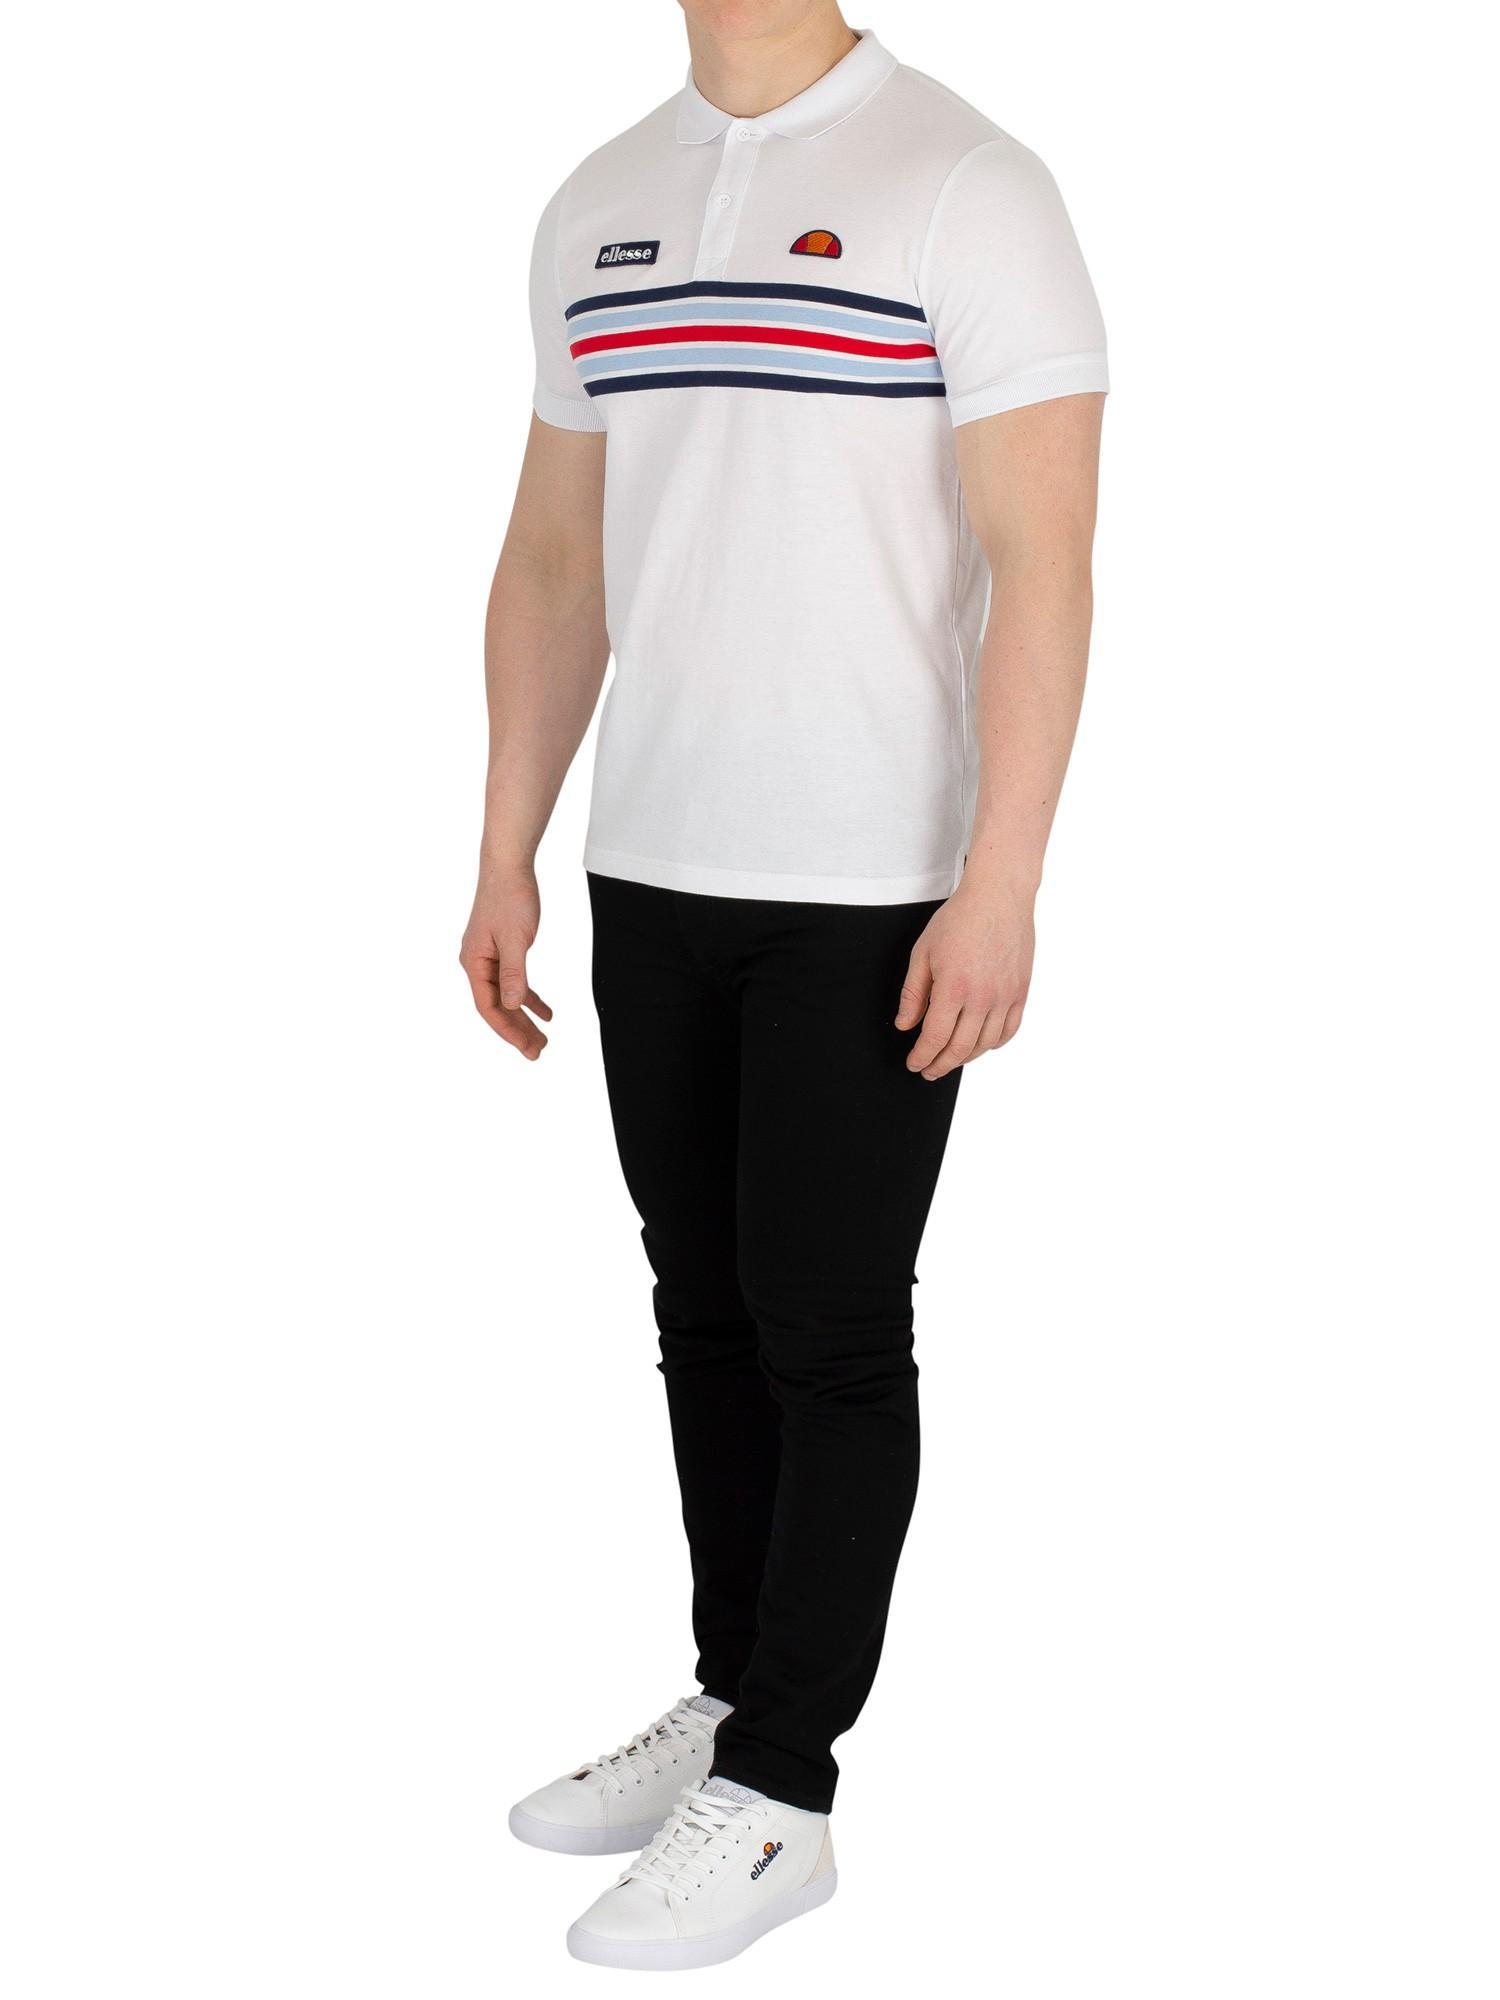 perspective caustic Van  Ellesse Cotton Pesaro Poloshirt in White for Men - Lyst